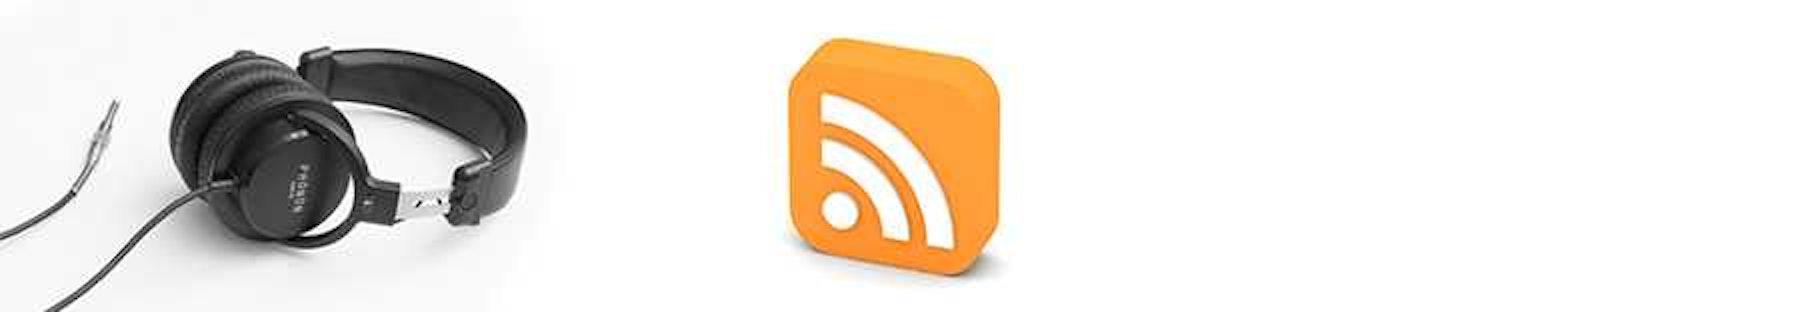 Podcast Episode 105 - Special Edition with Scott Ballard